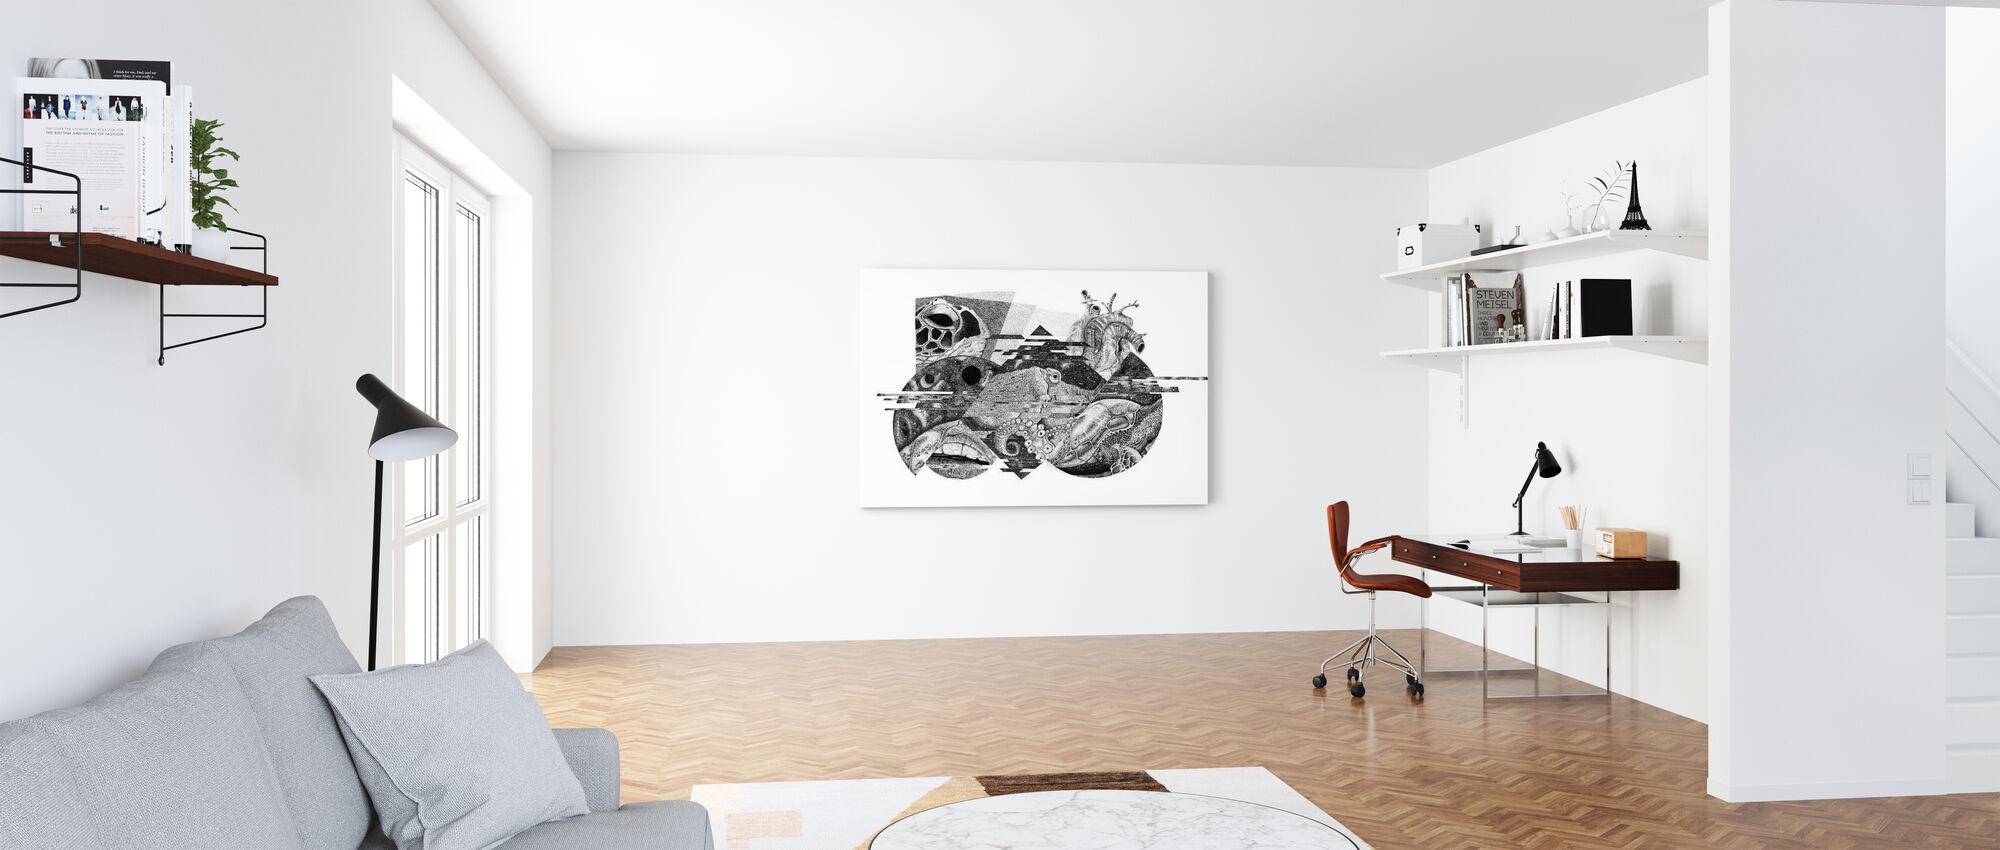 Interrupted Universe VI - Canvas print - Office